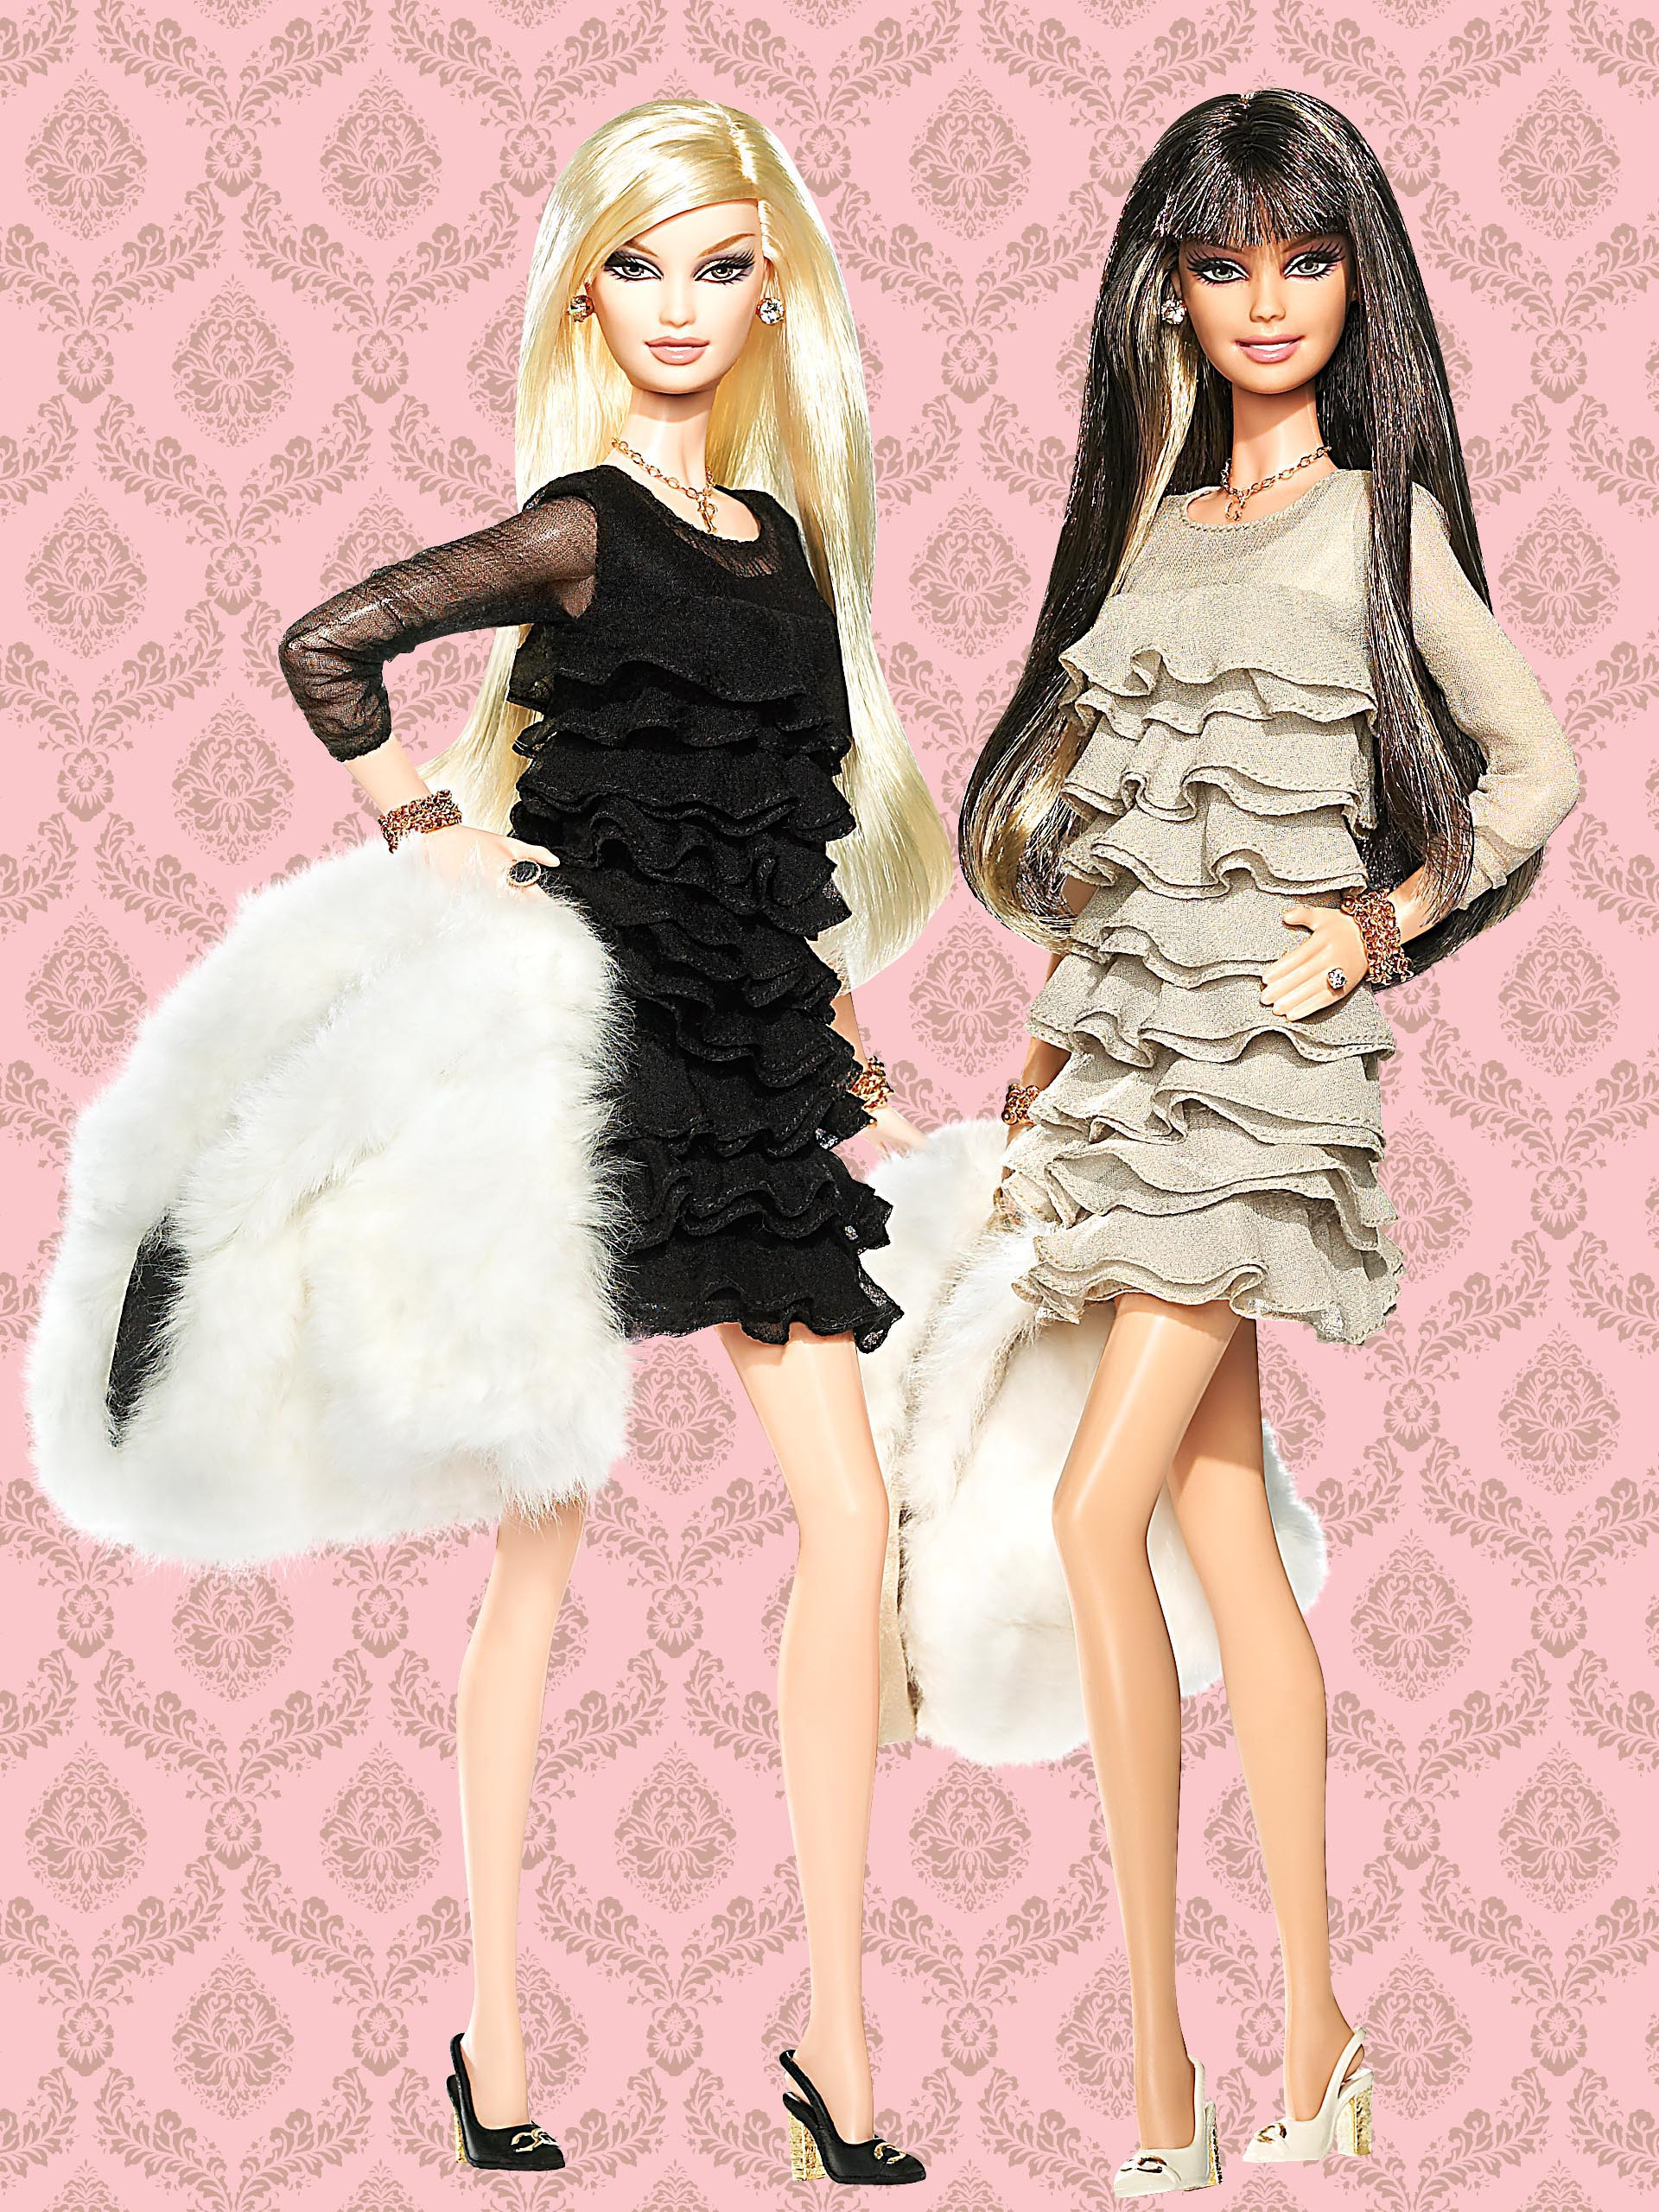 Juicy Couture Barbie Dolls